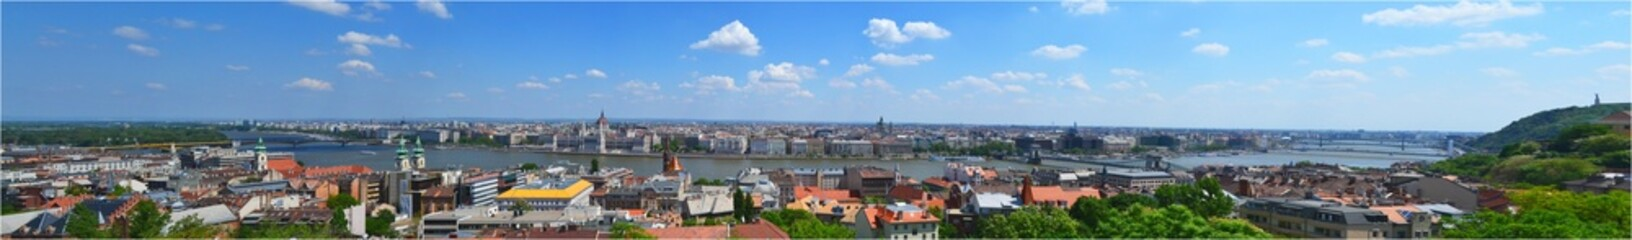 Panoram Budapest - Hongrie